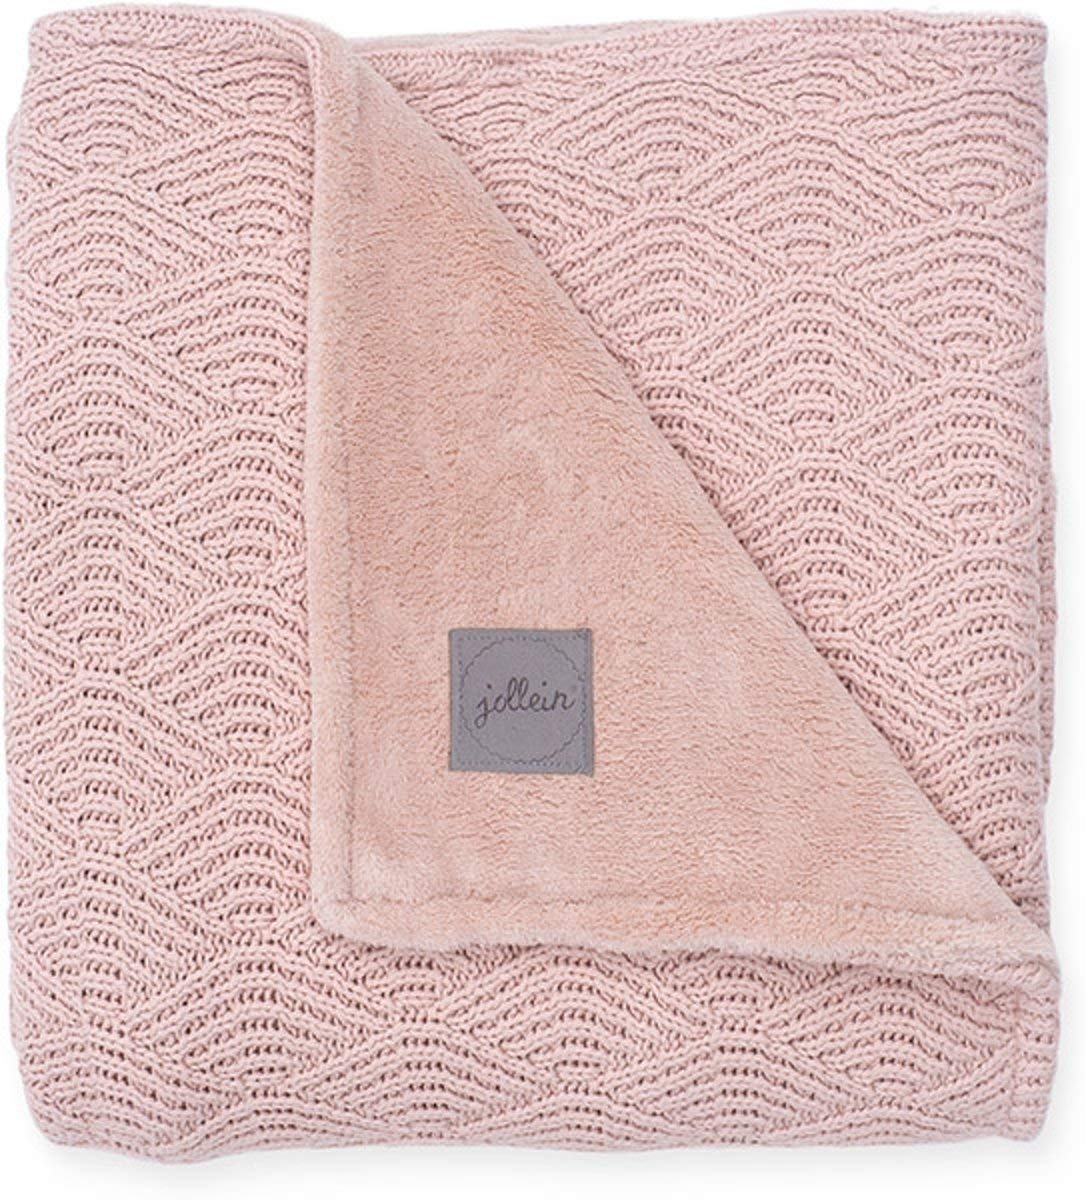 Jollein Strickdecke Babydecke 75x100 River knit cream whithe corale fleece